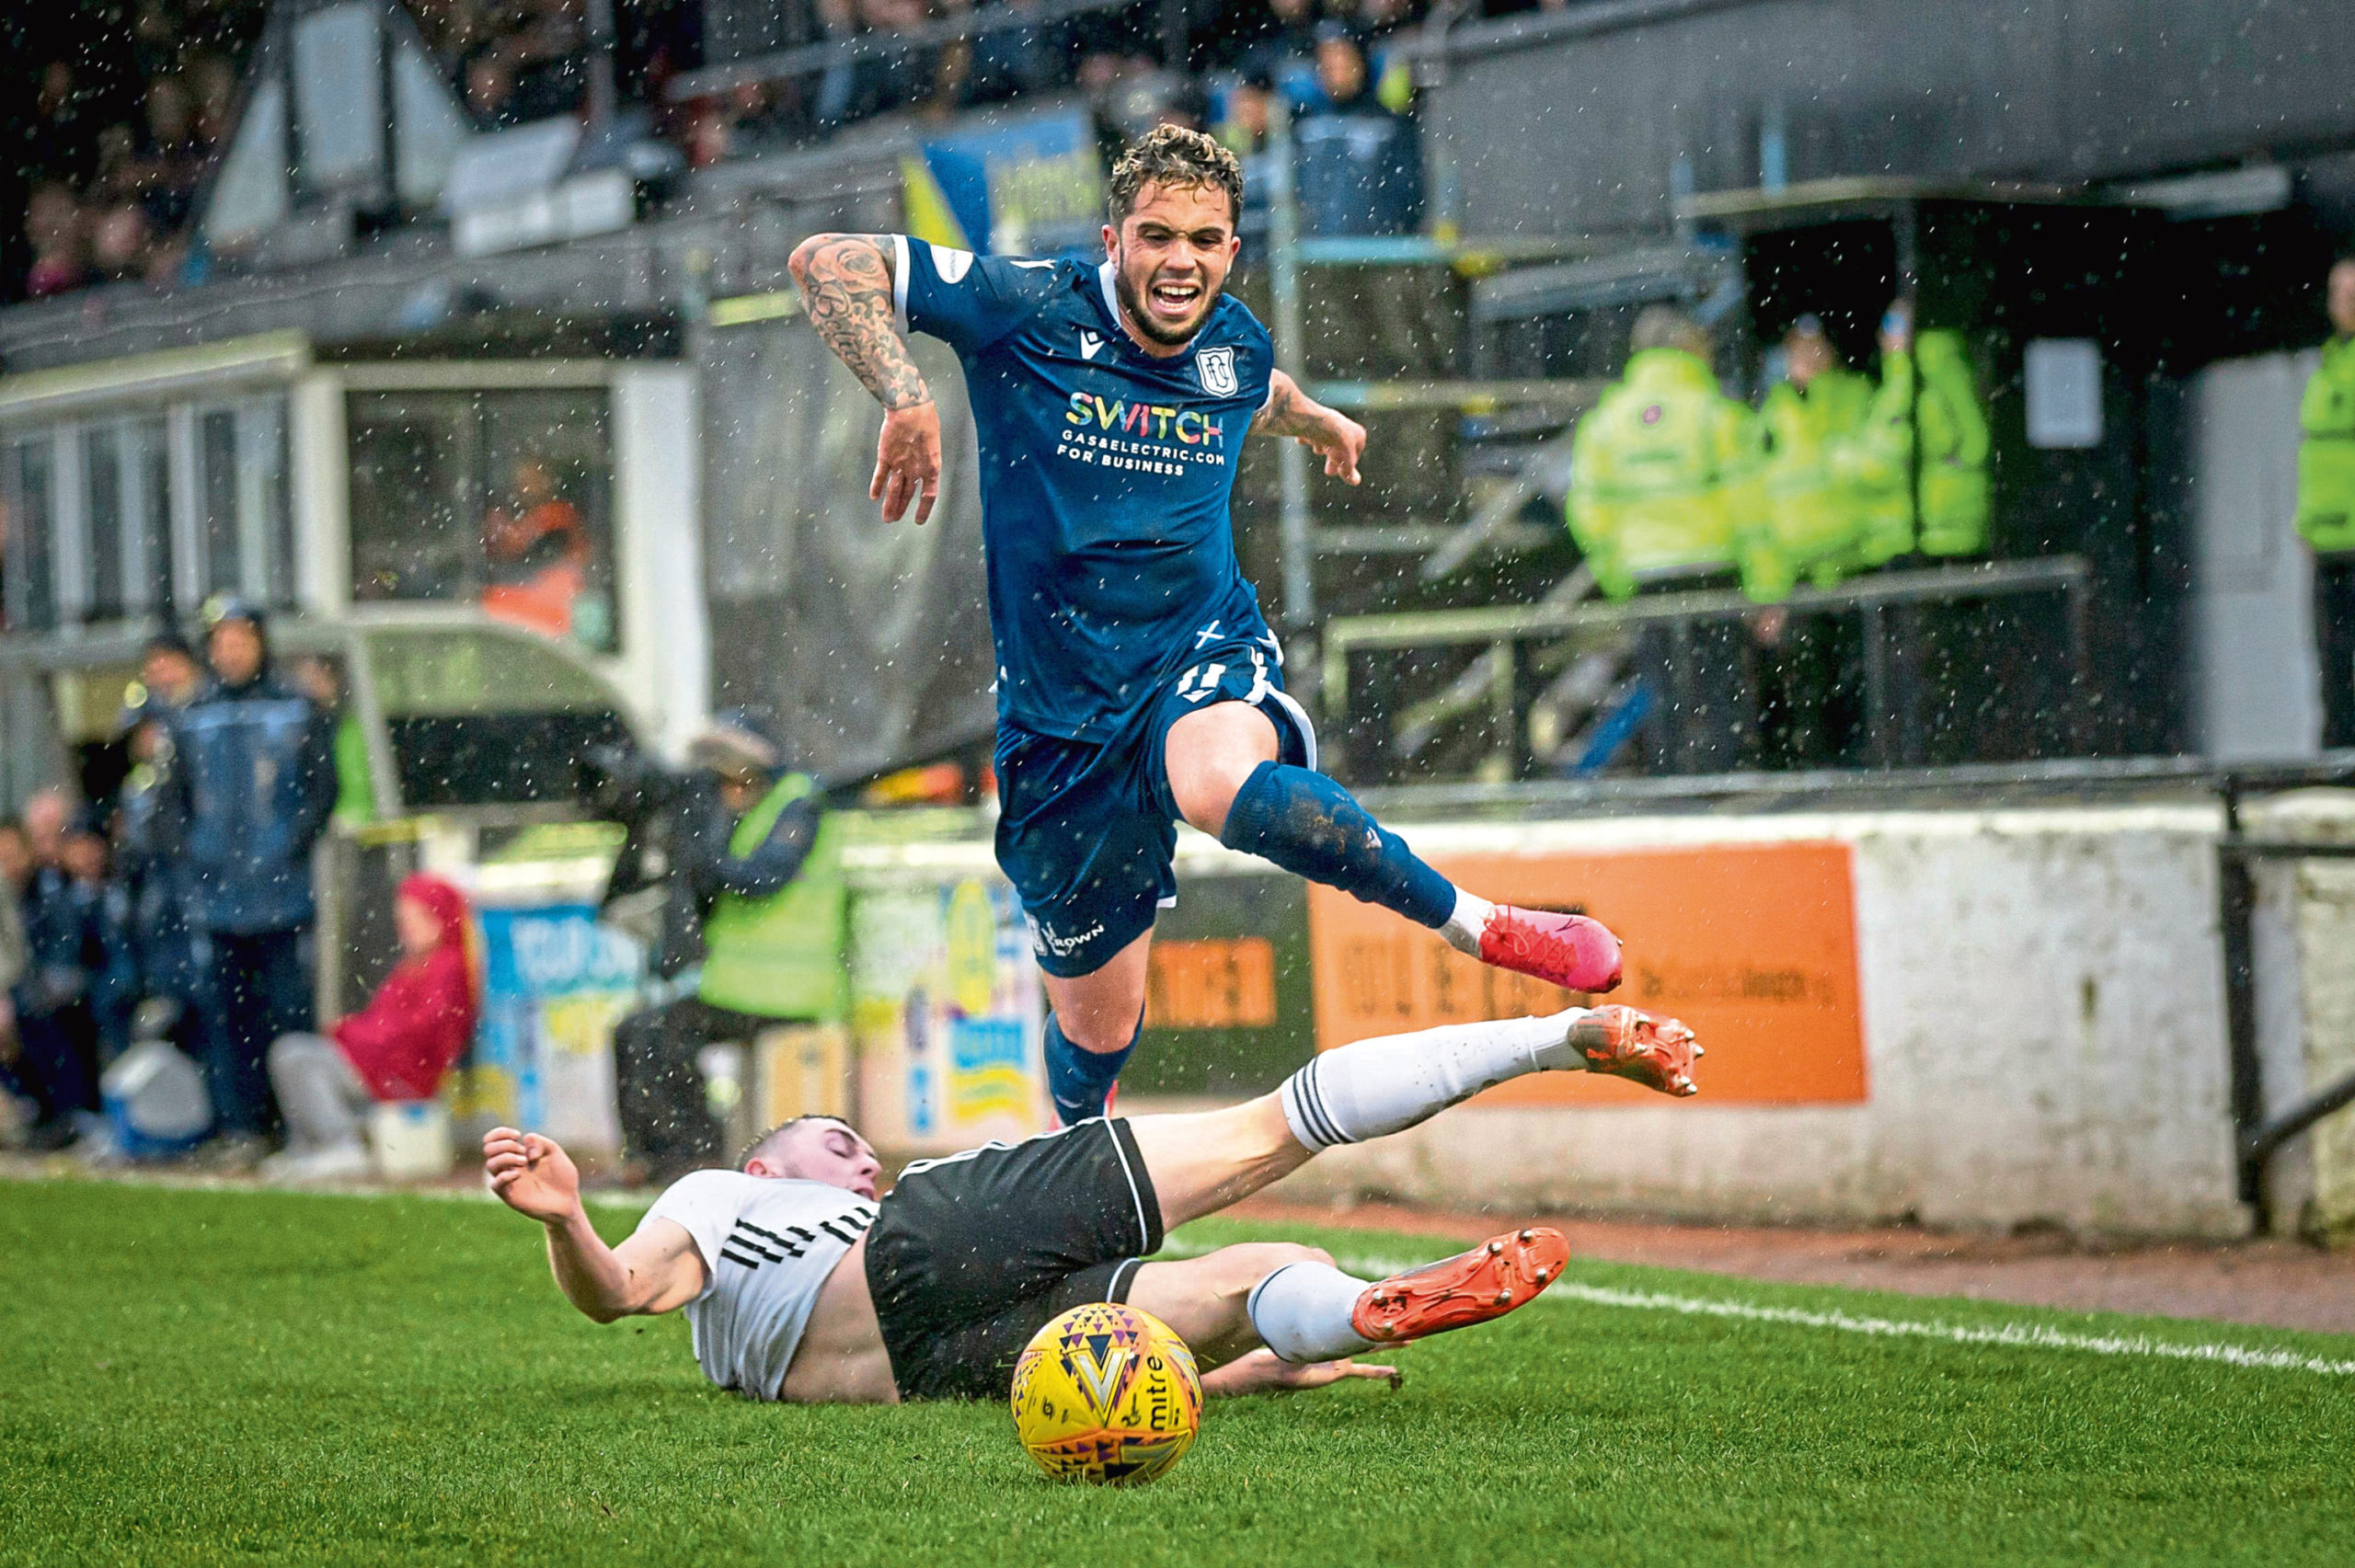 Declan McDaid can make an impact in top flight says McPake